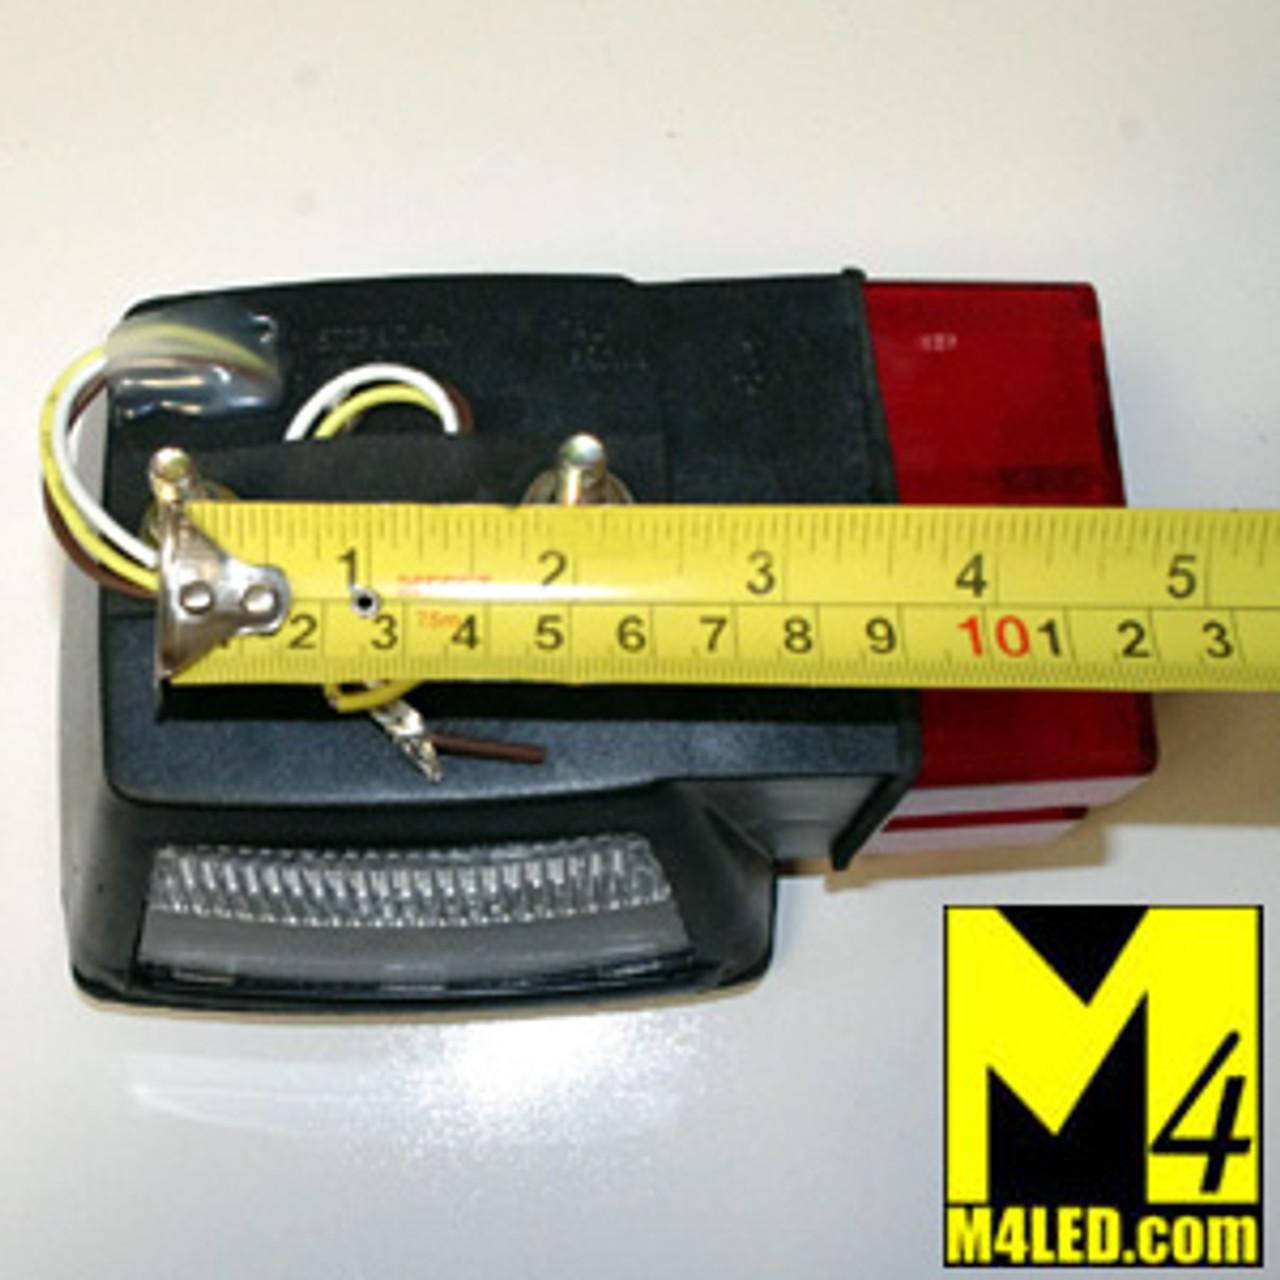 15% Off Submersible Trailer LED Tail Lamp Kit